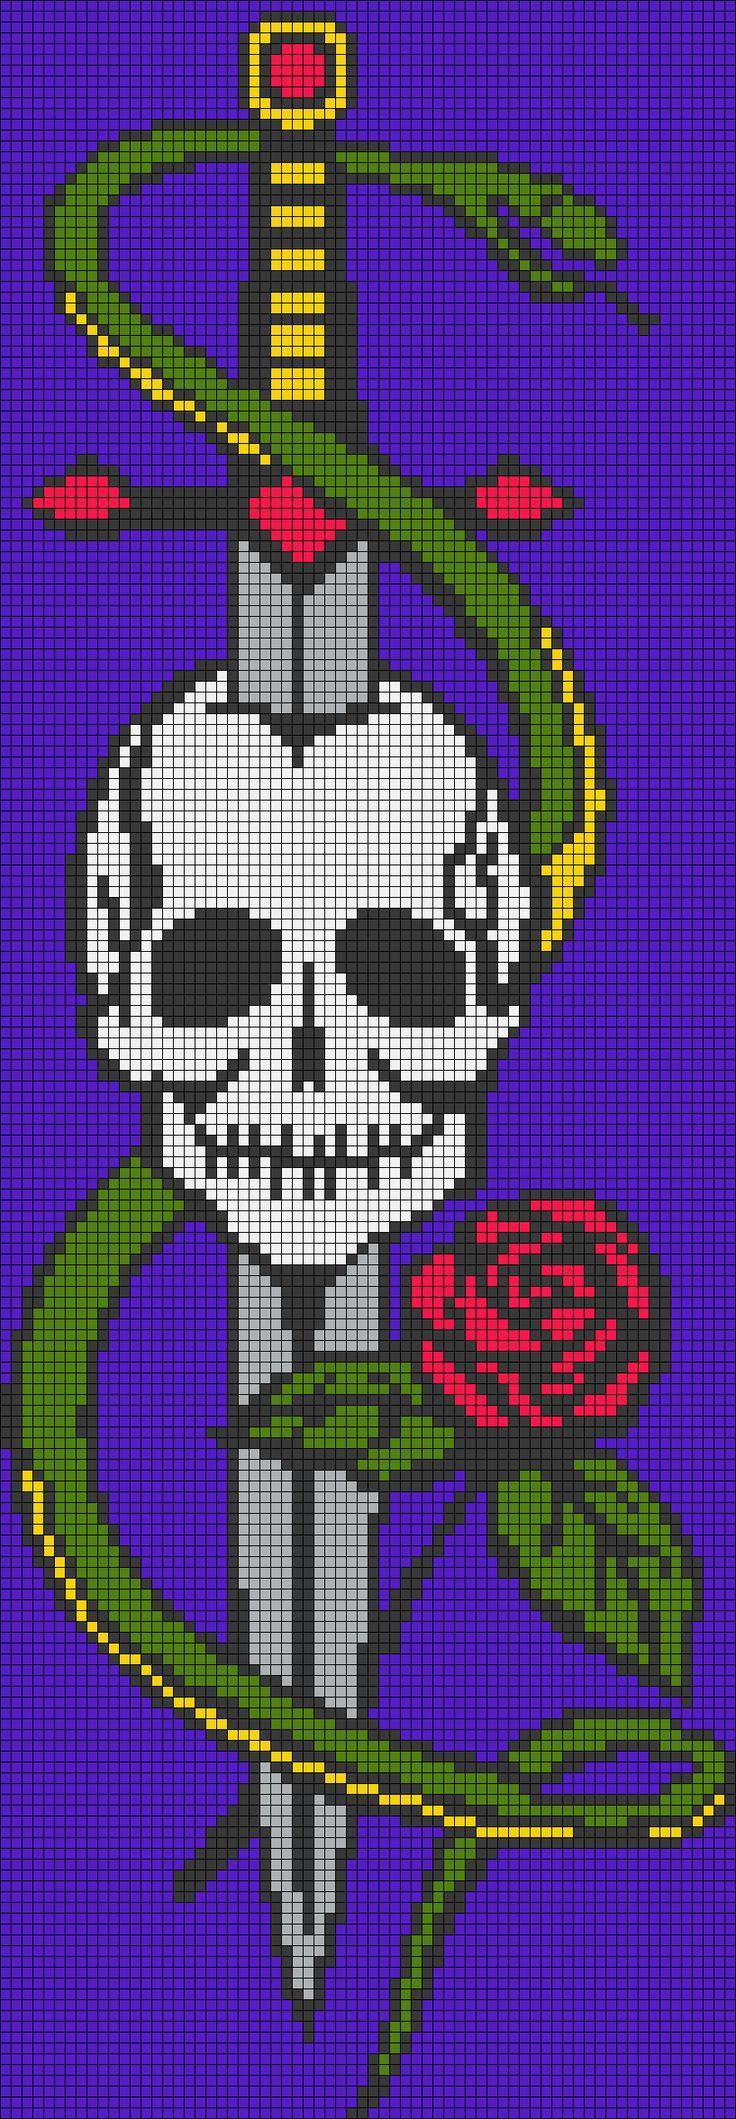 25 best ideas about Minecraft pixel art on Pinterest